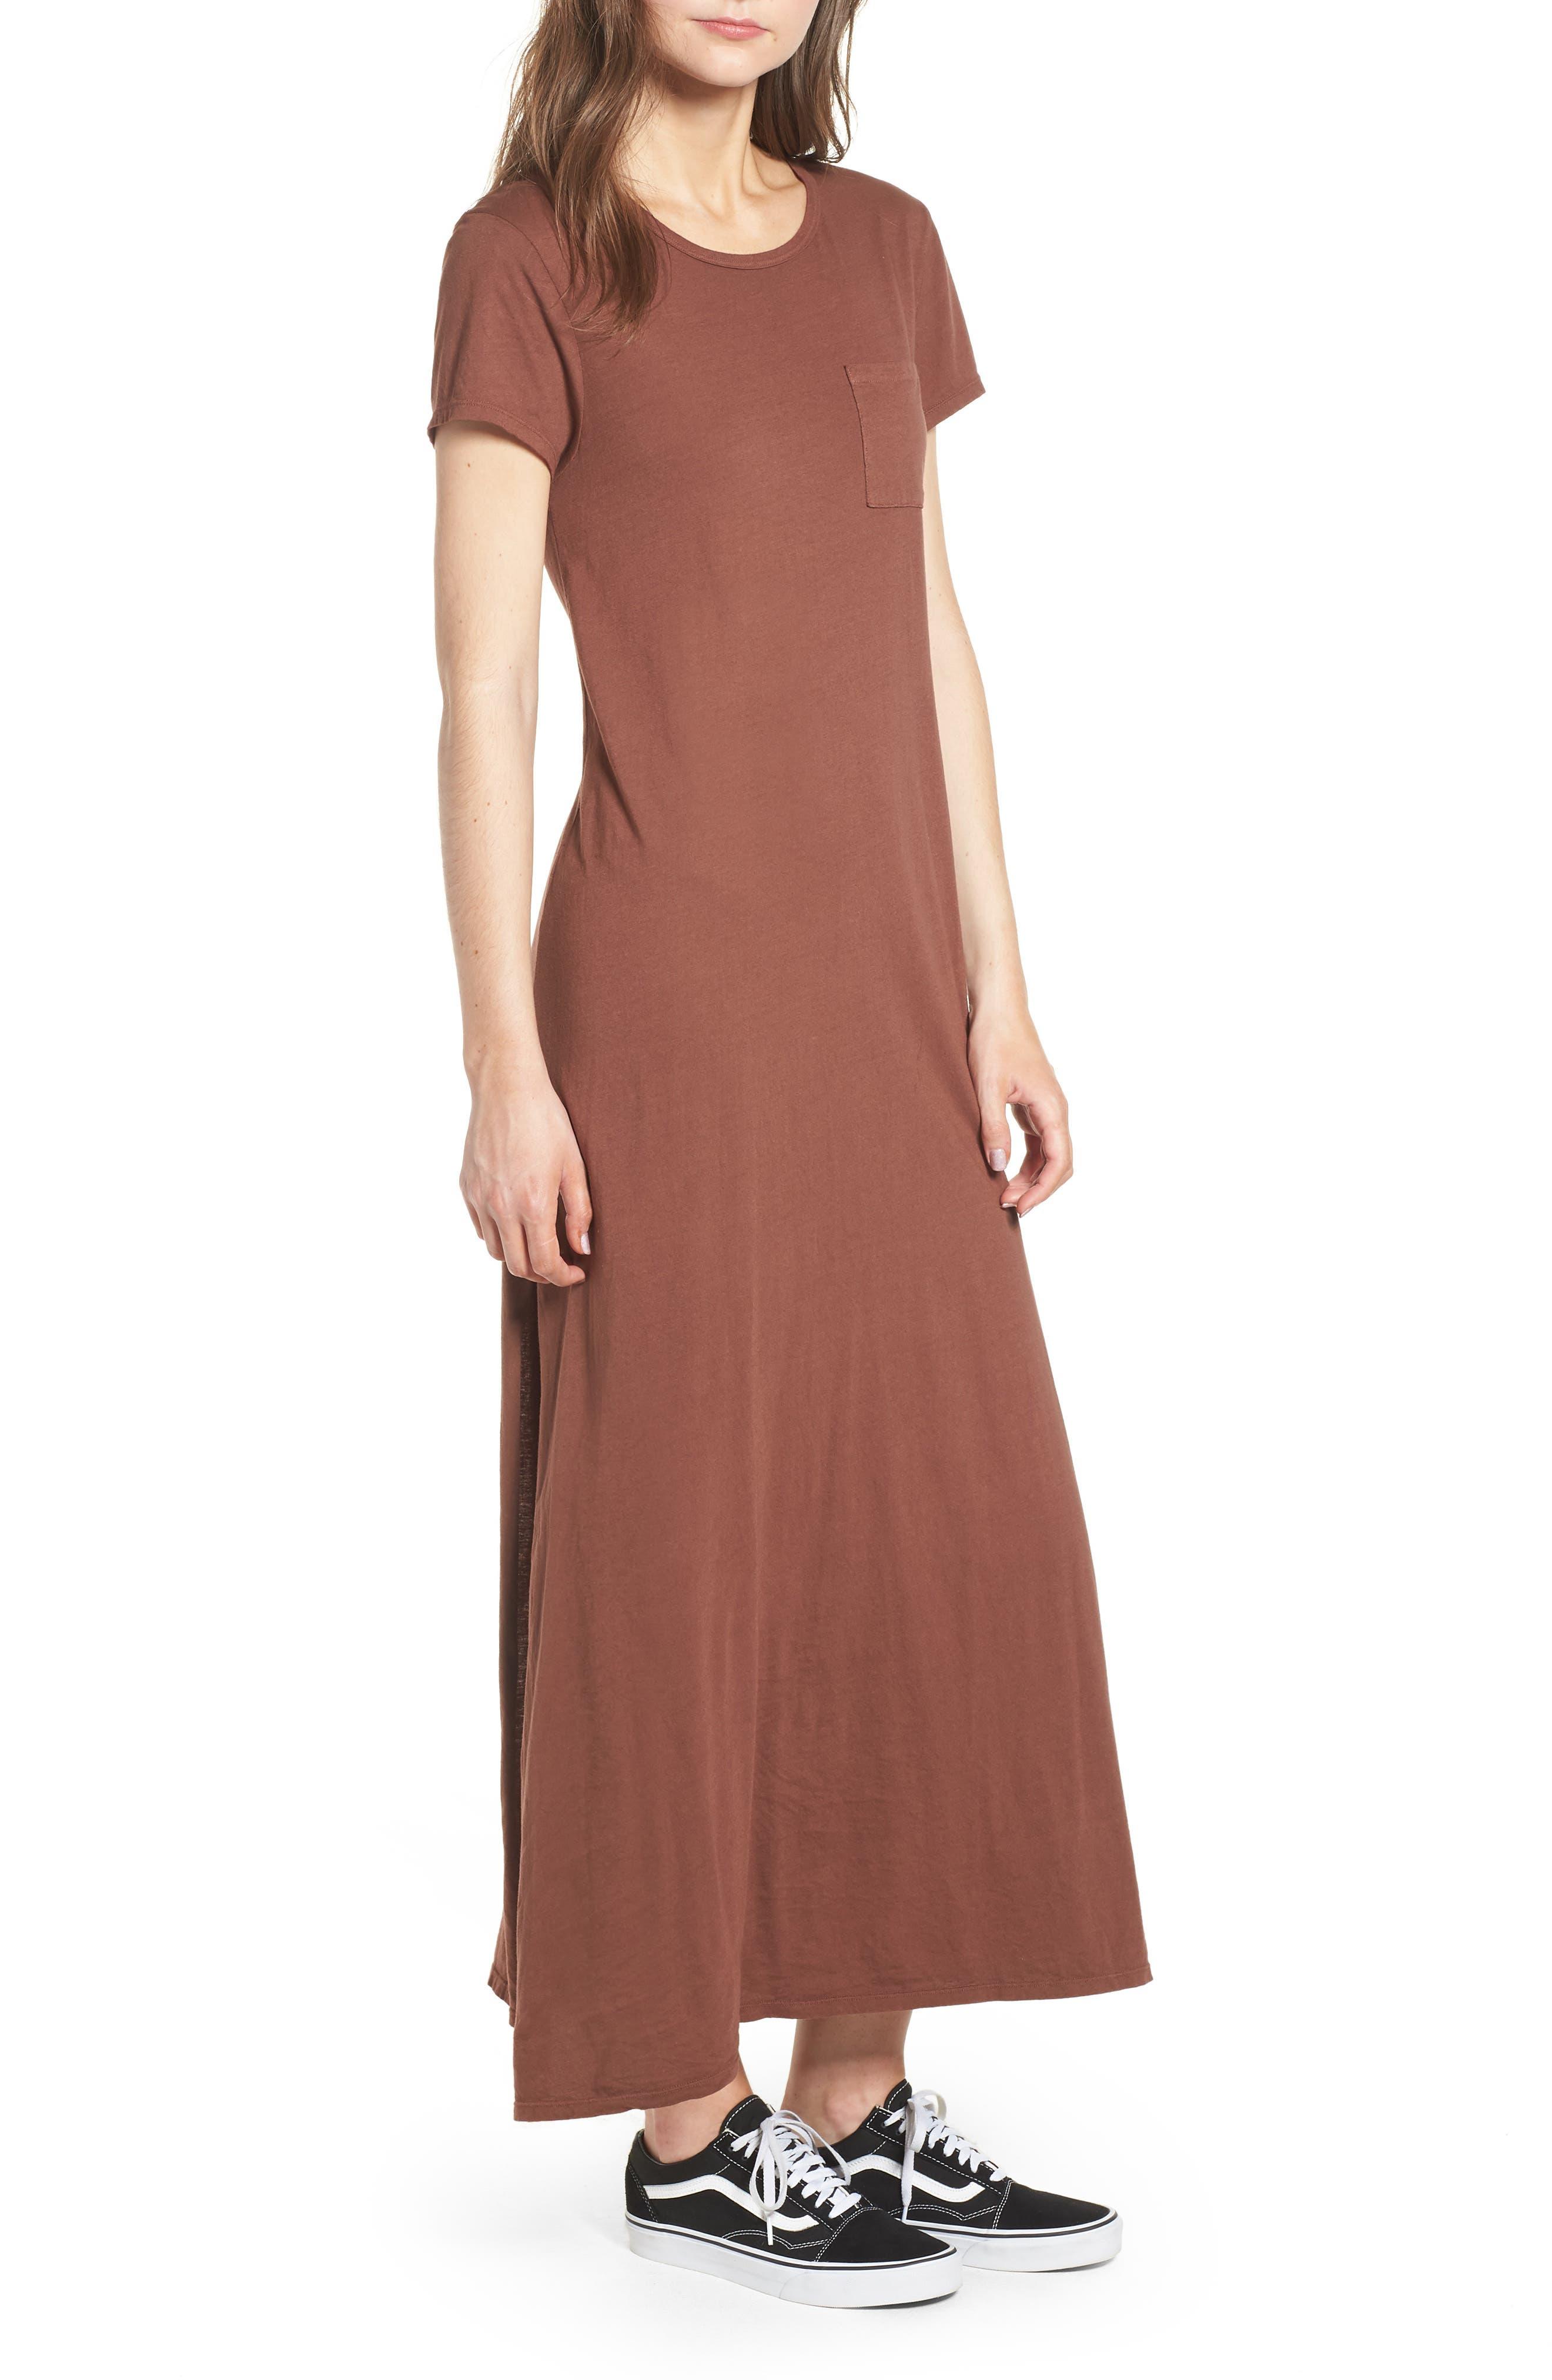 Alana Side Slit T-Shirt Dress,                             Alternate thumbnail 4, color,                             Nutmeg